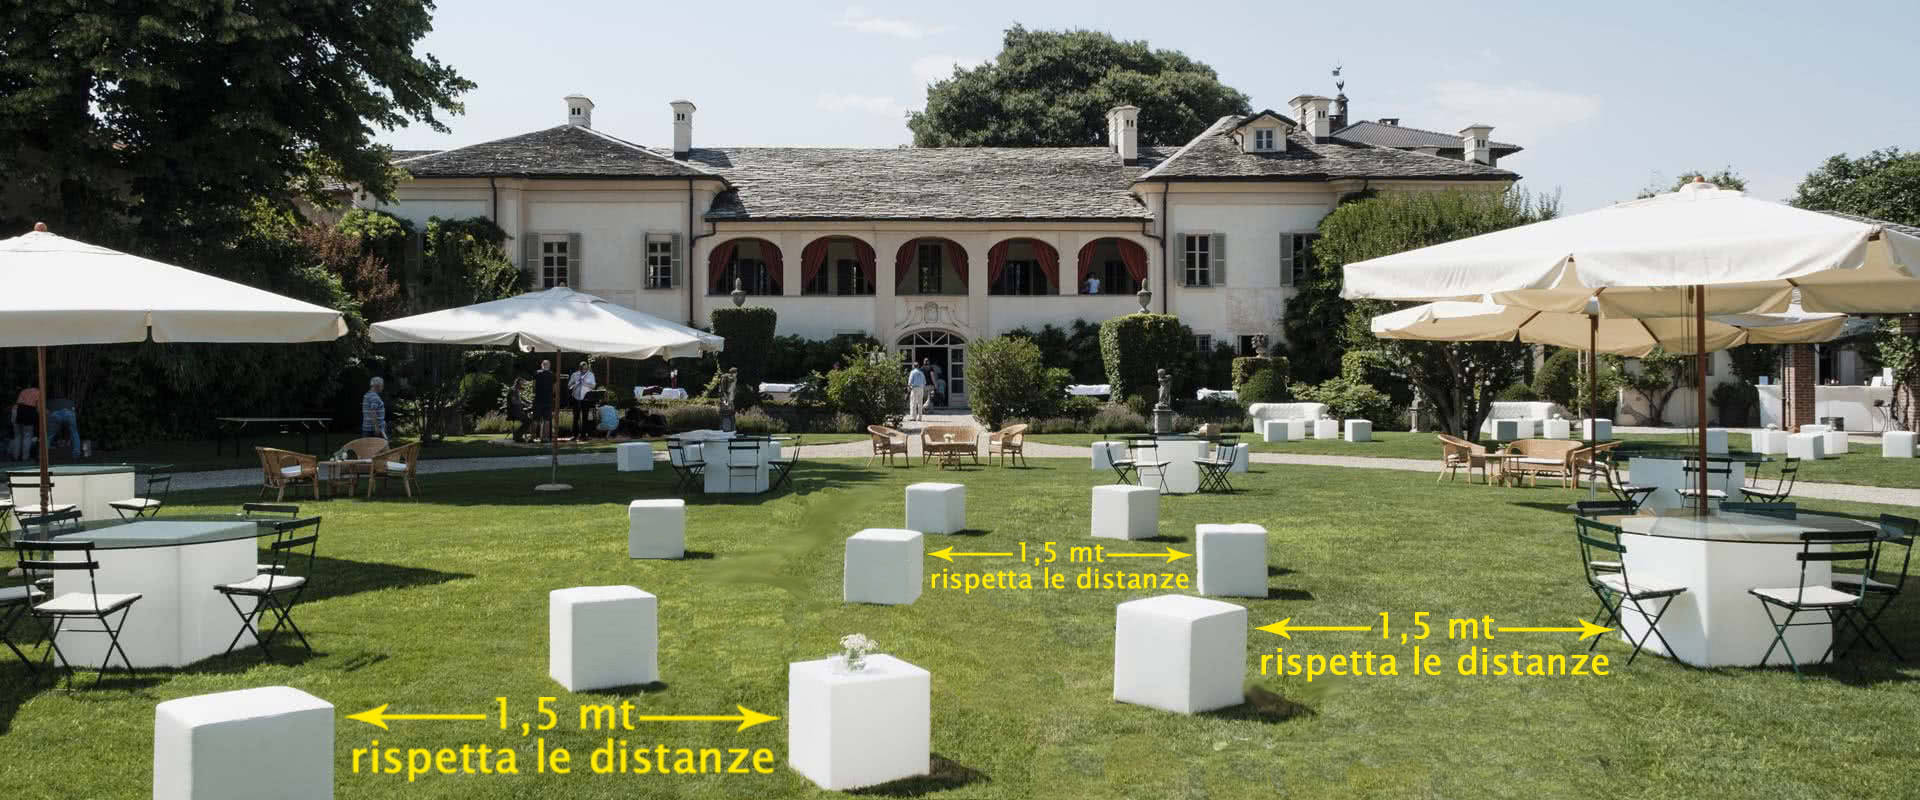 slide-homepage-2-noleggio-arredi-matrimonio-esterno-covid-2